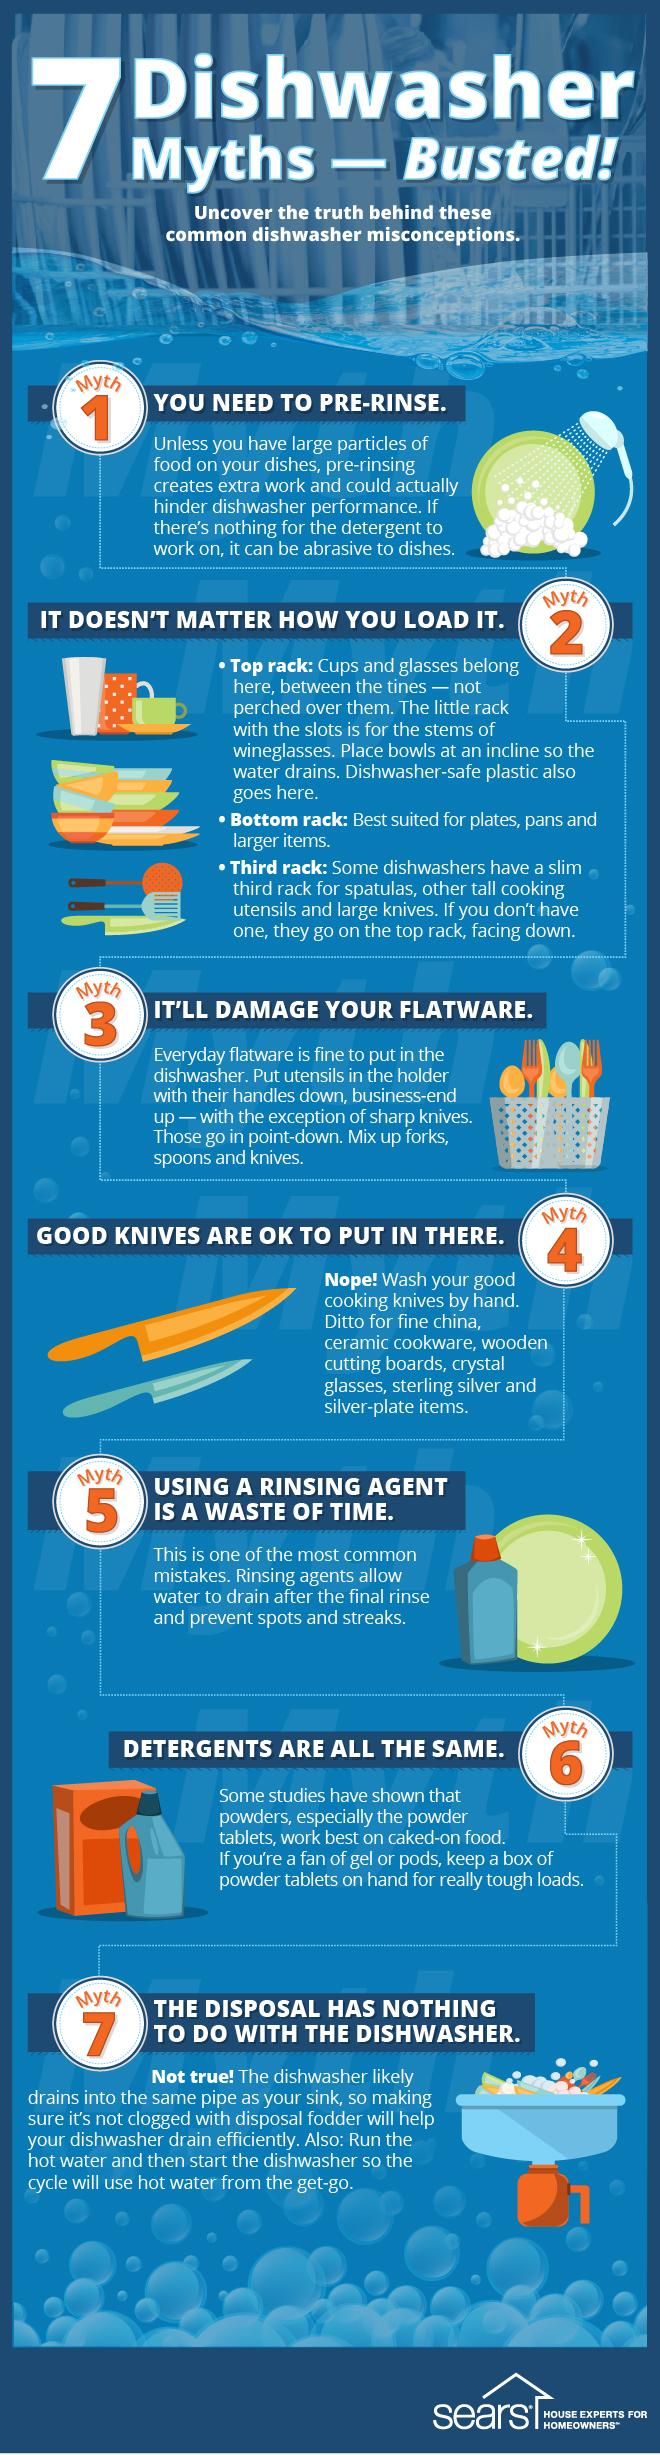 7 Dishwasher Myths